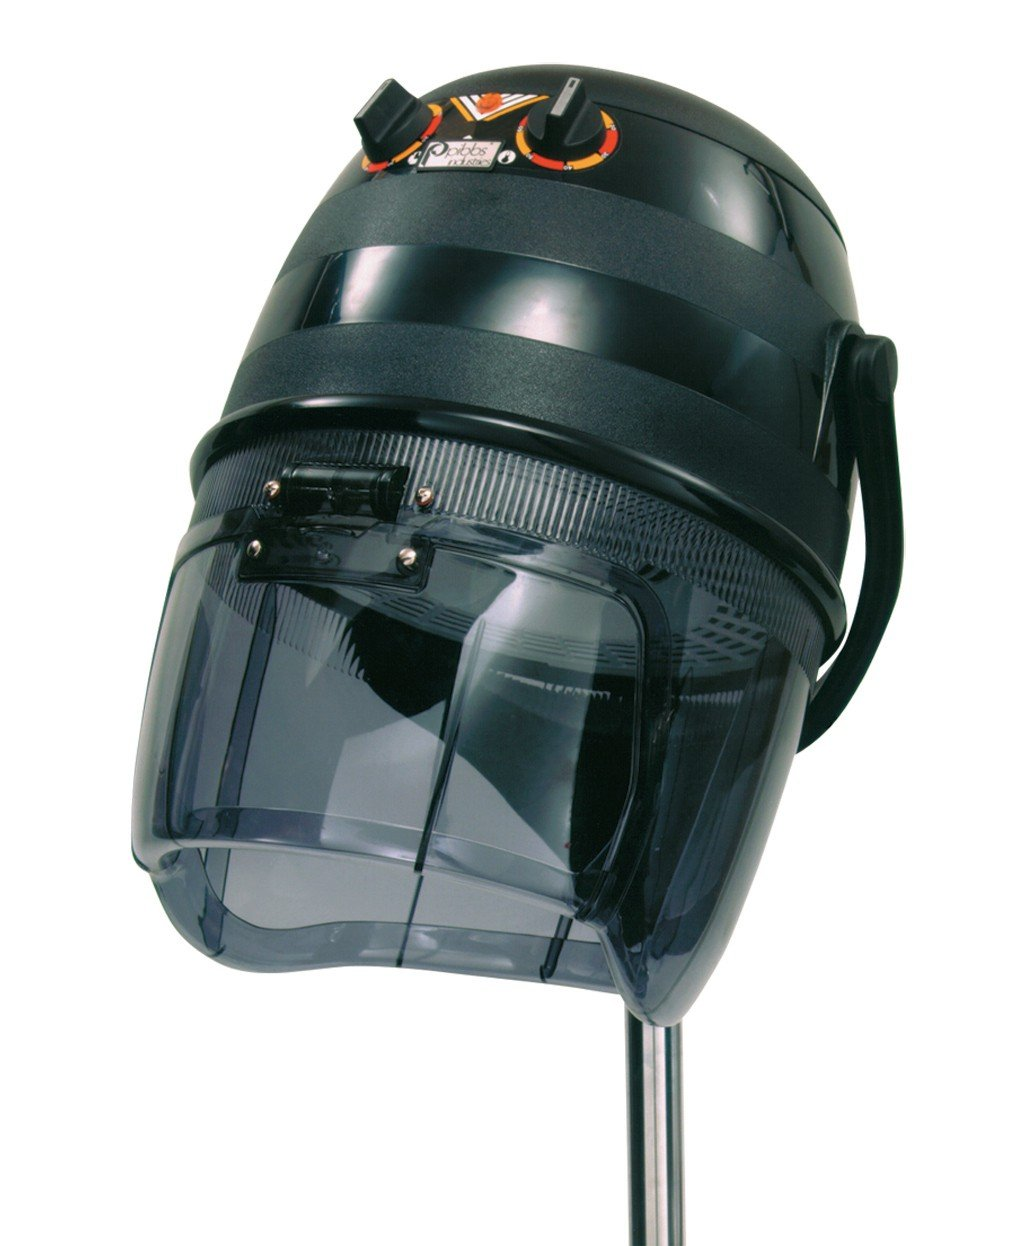 Pibbs 514 Kwik Dri 1100W Salon Dryer with Casters